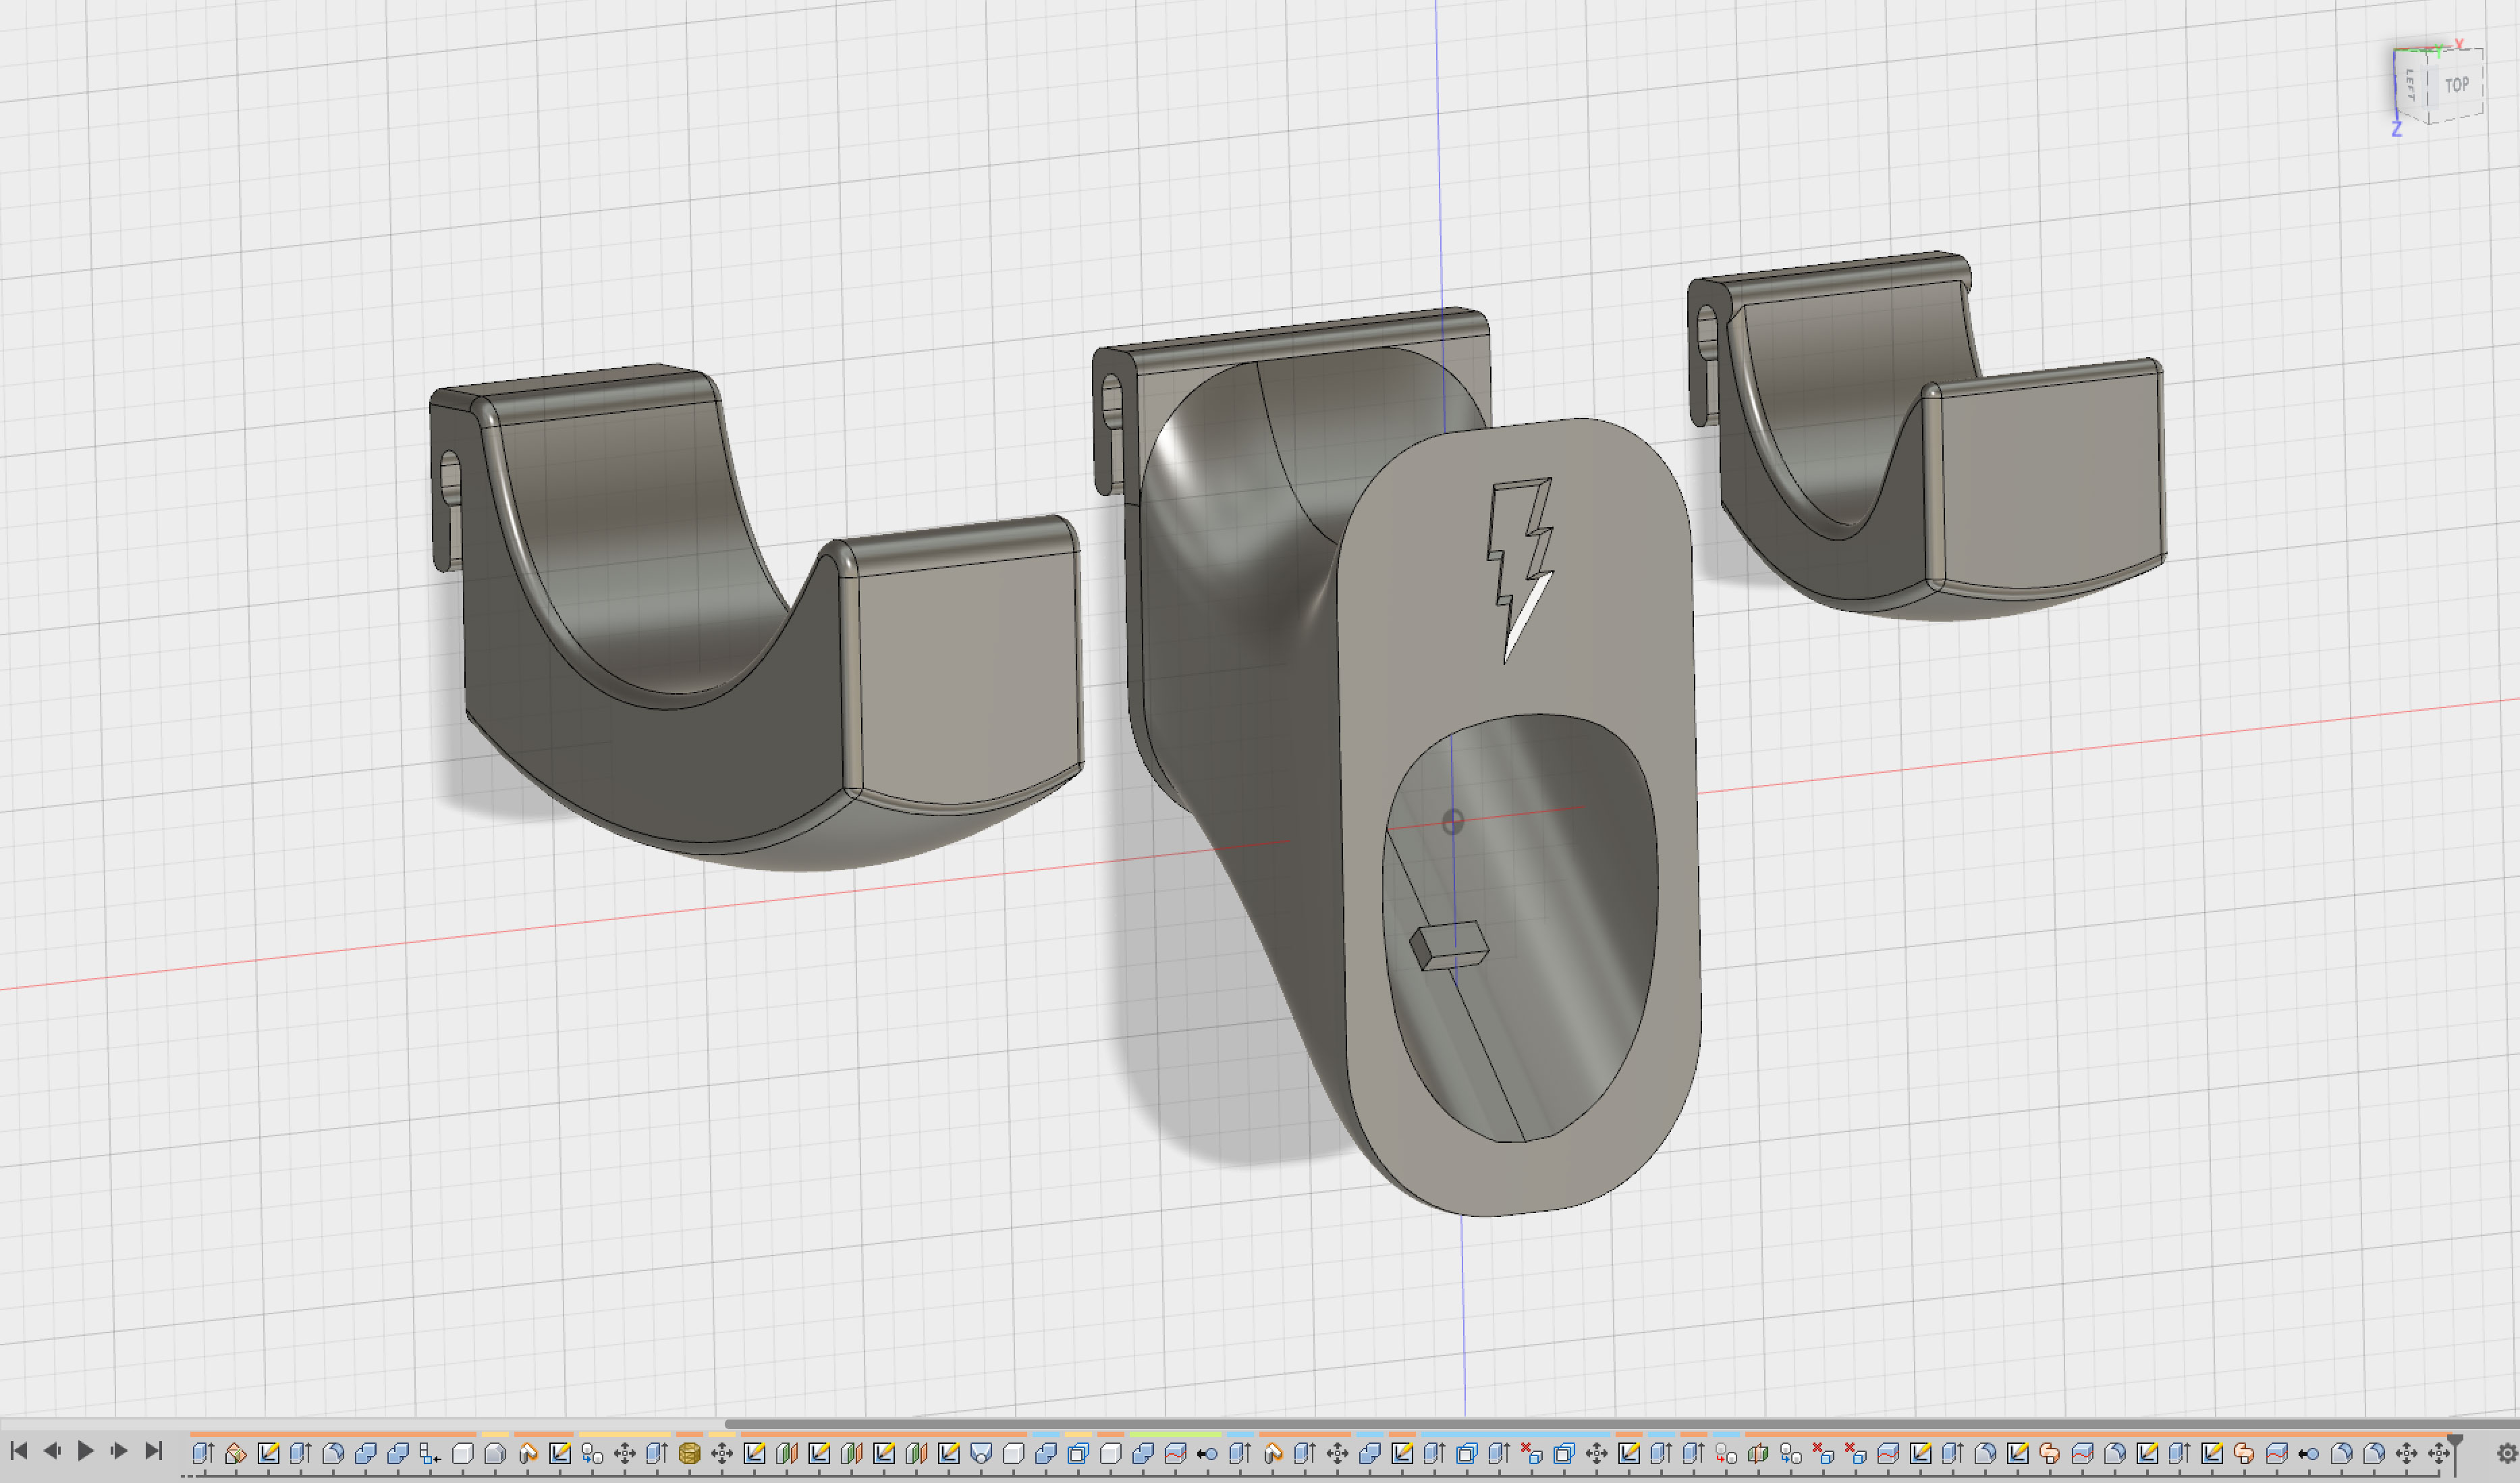 3d_printing_cad-all-parts.jpg